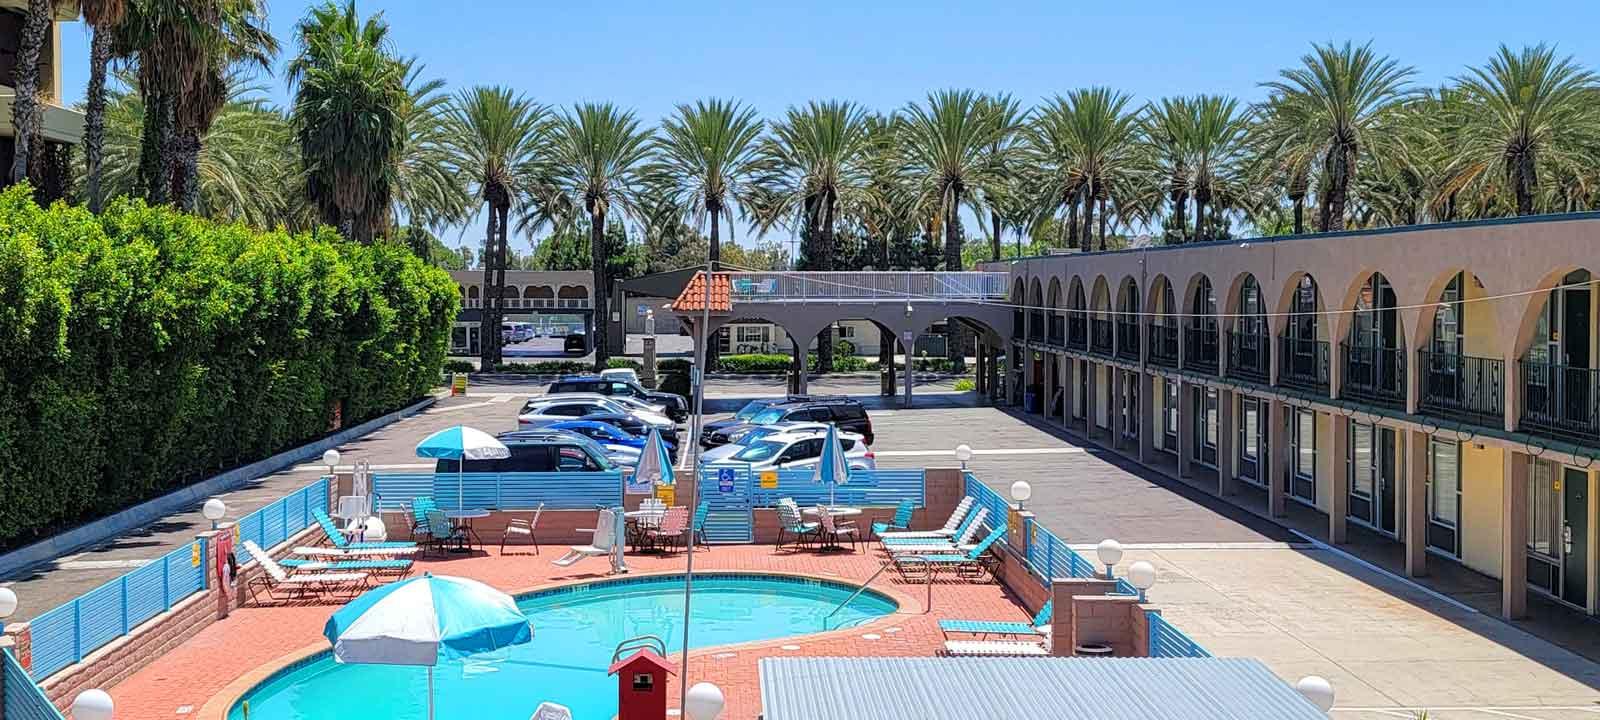 1-Kings-Inn-Anaheim-Hotel-near-Disneyland-Park-1600